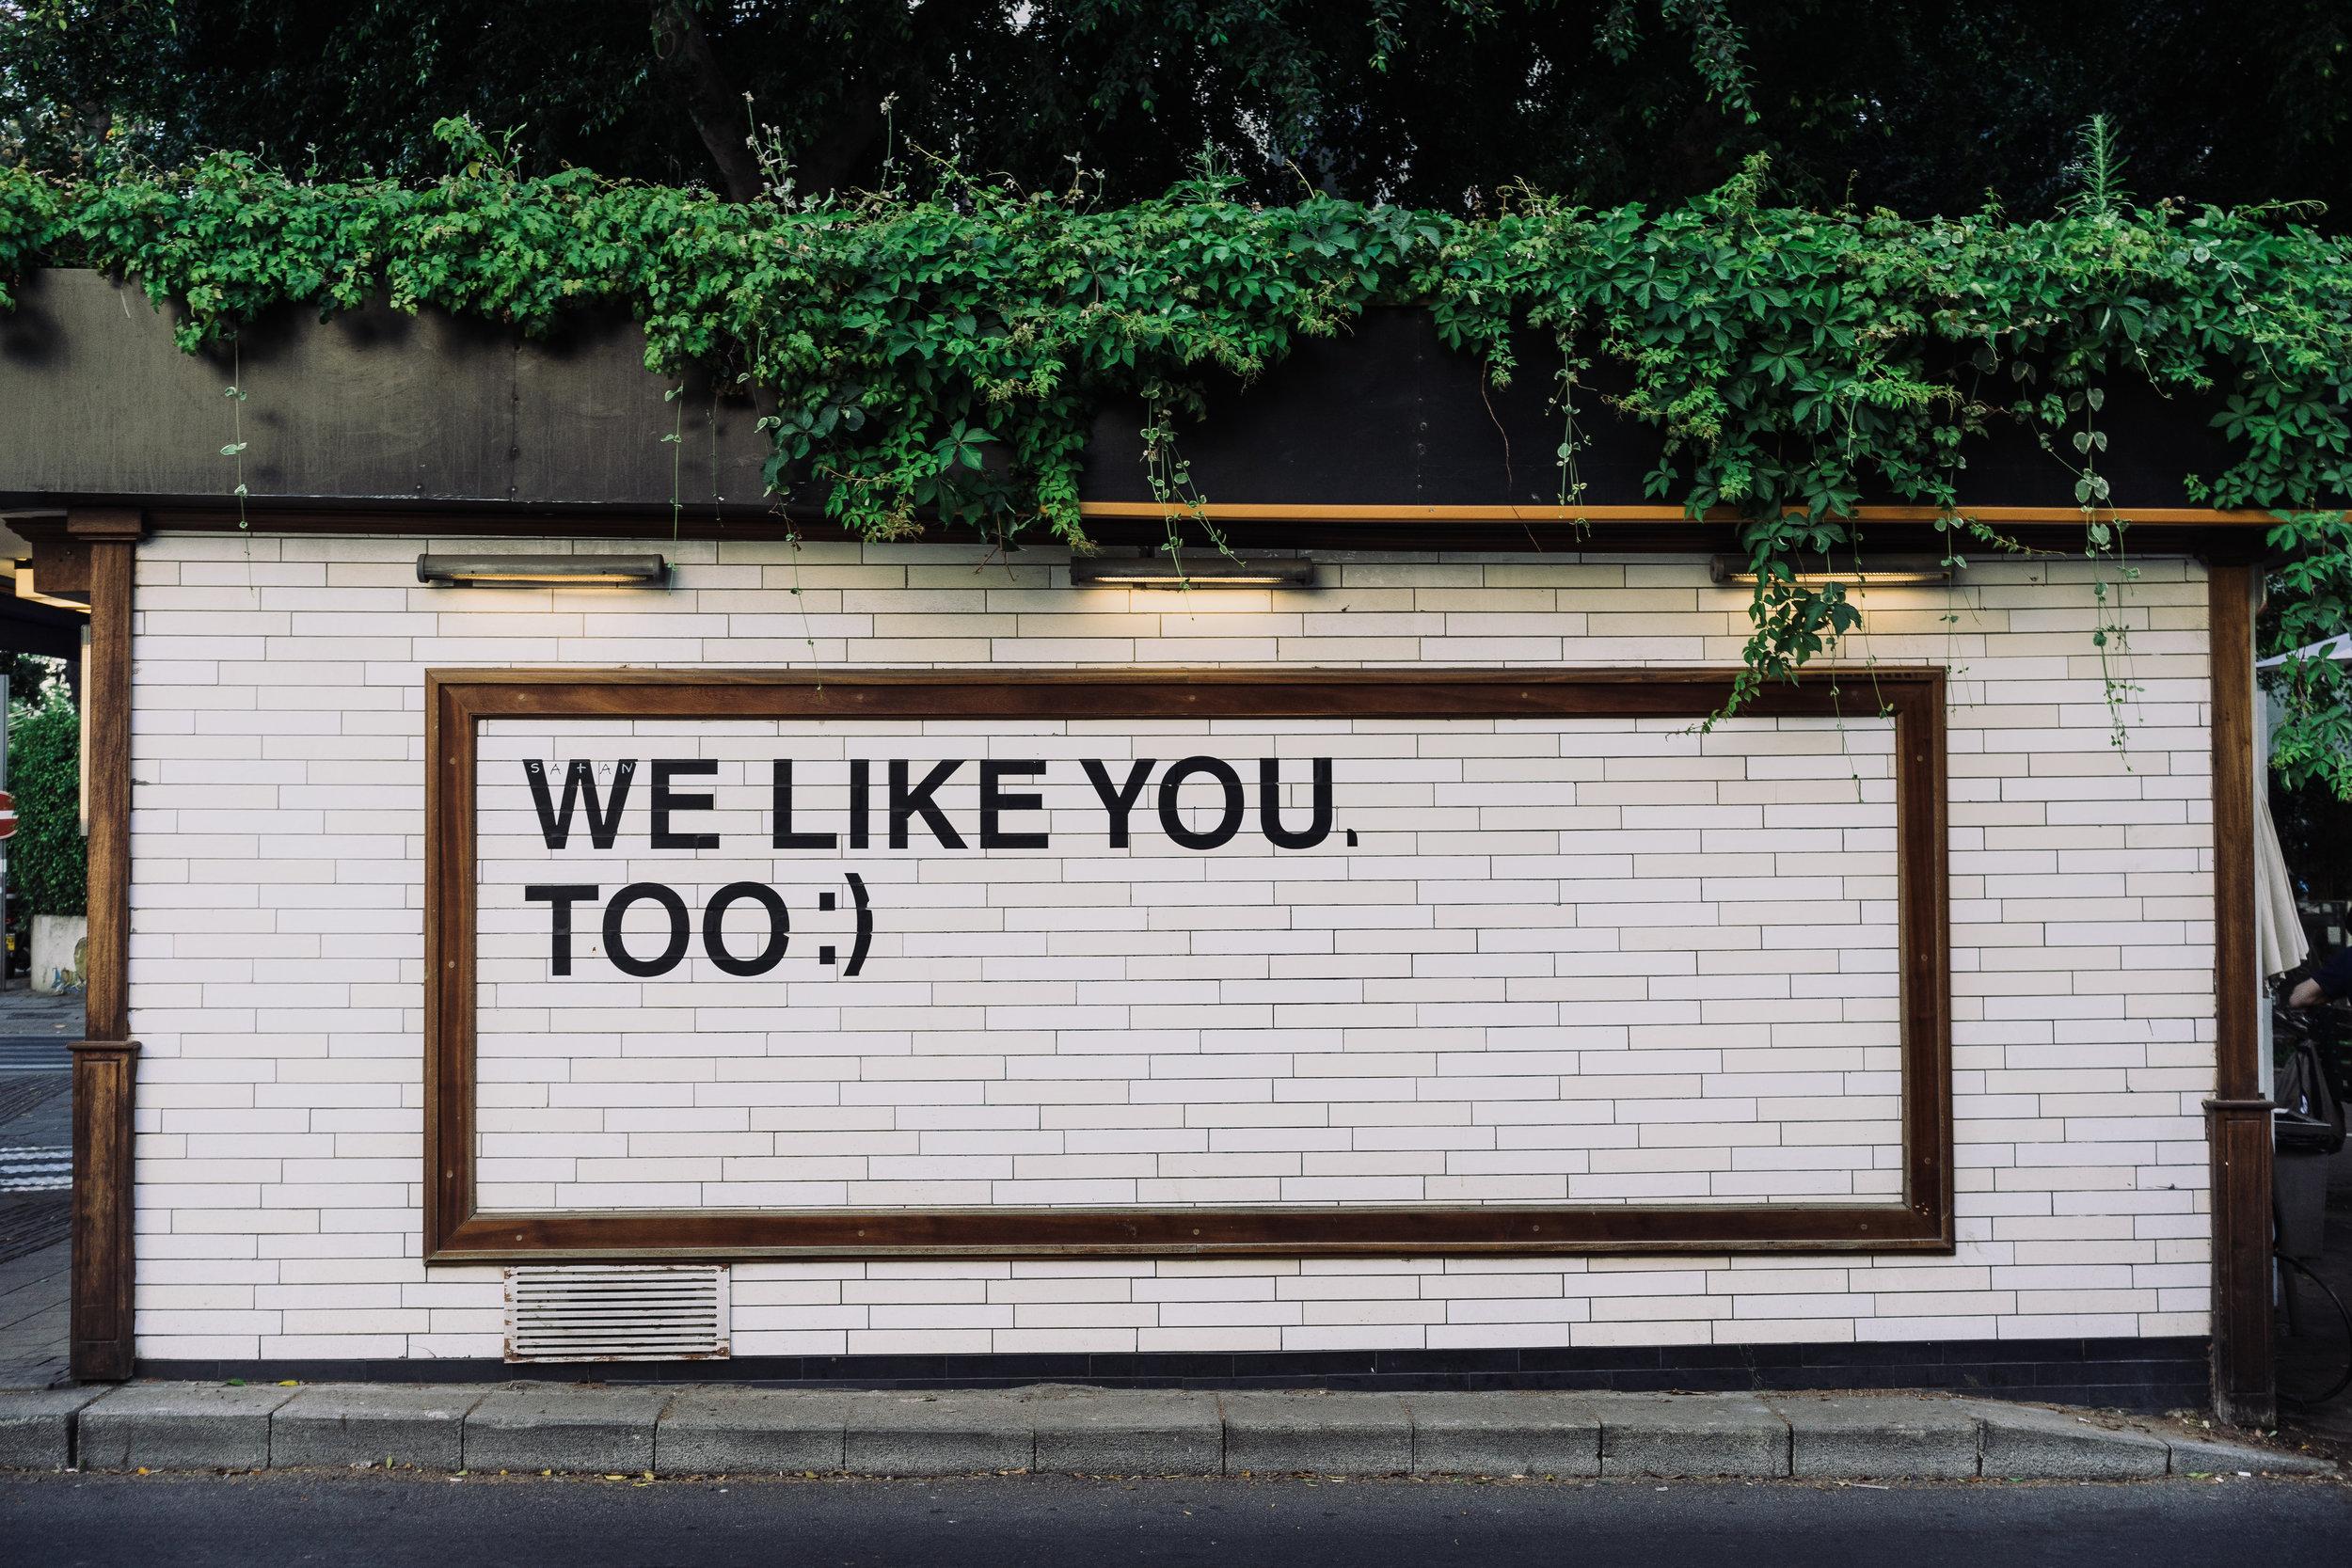 We like you too